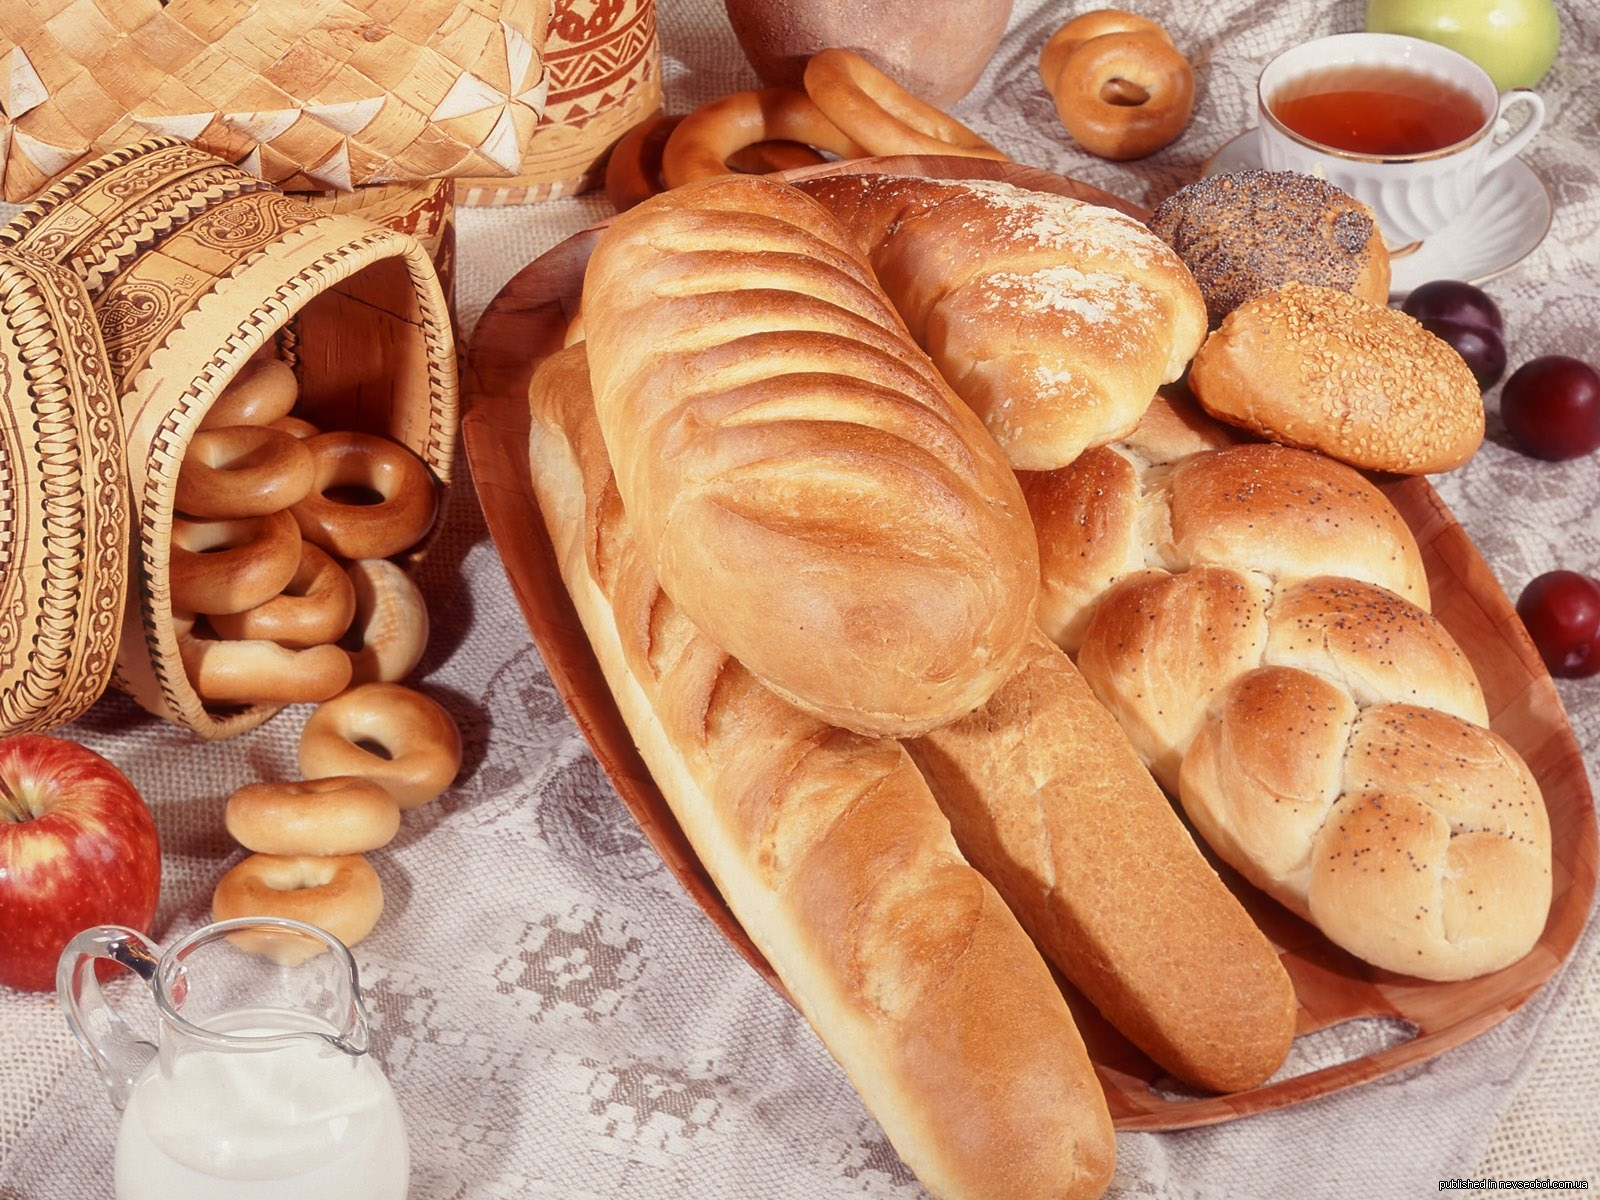 История хлеба. Кто придумал хлеб?